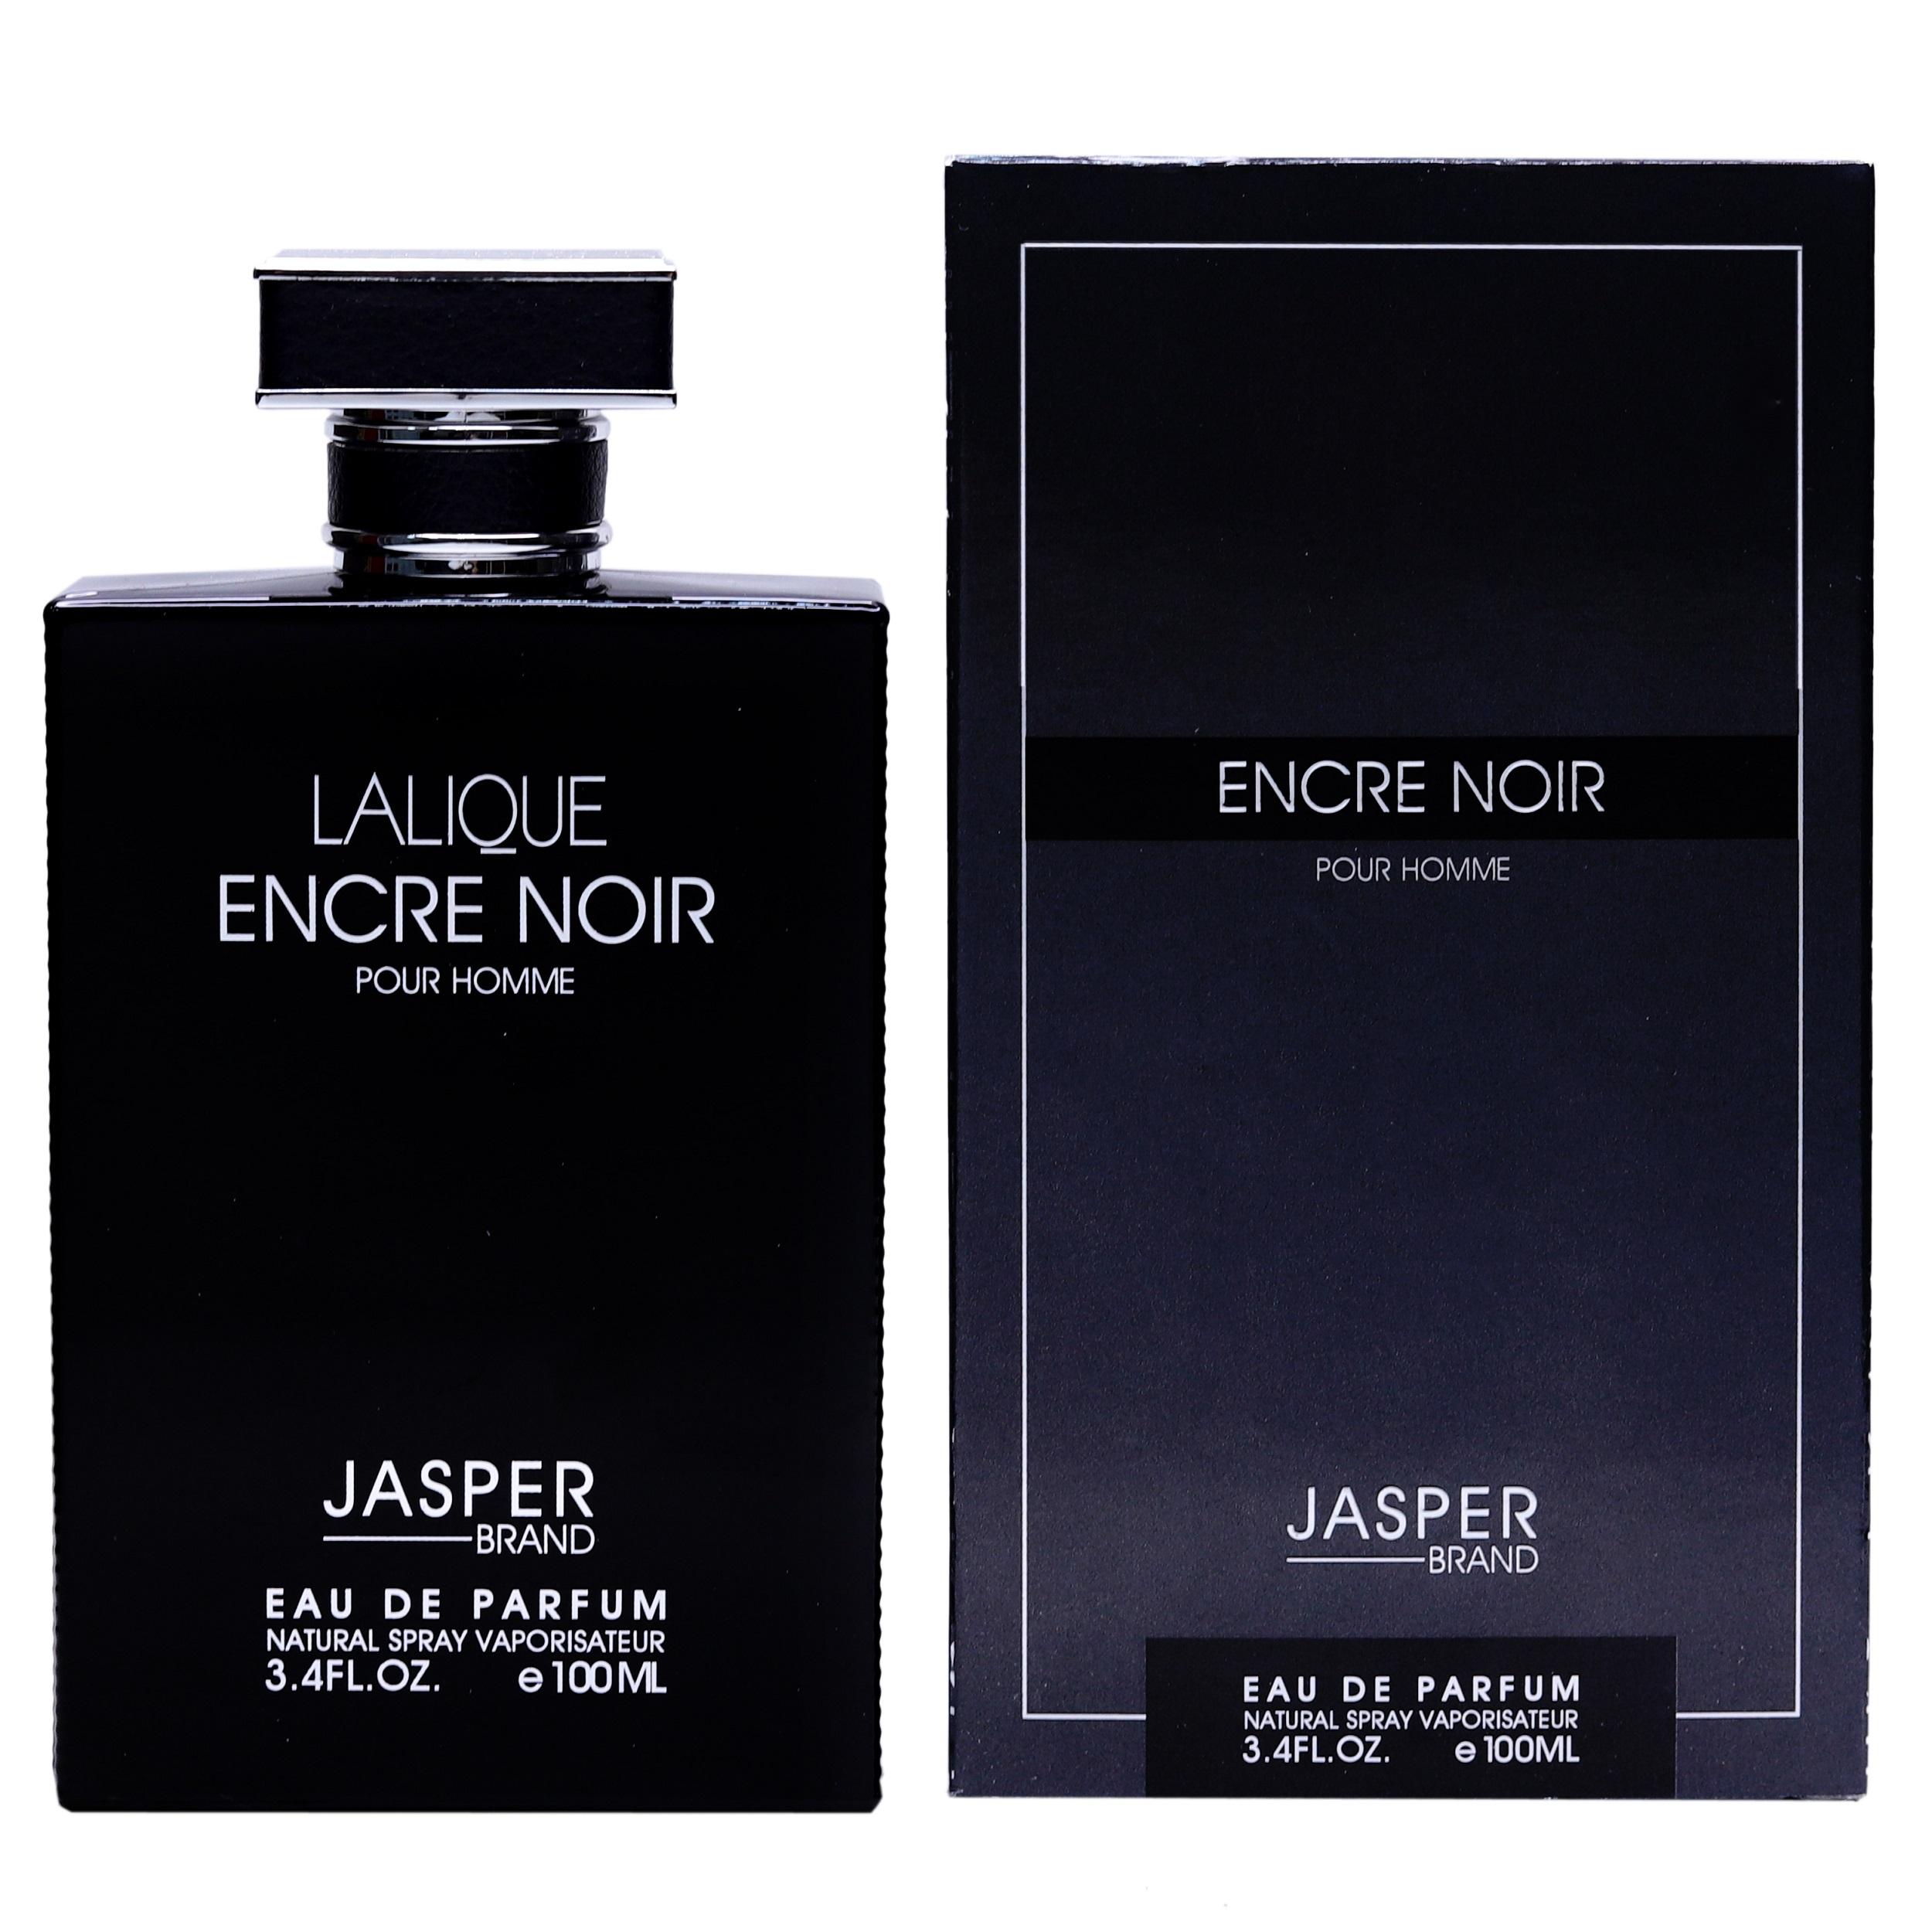 ادو پرفیوم مردانه جاسپر مدل LALIQUE encre noire حجم 100 میلی لیتر main 1 1